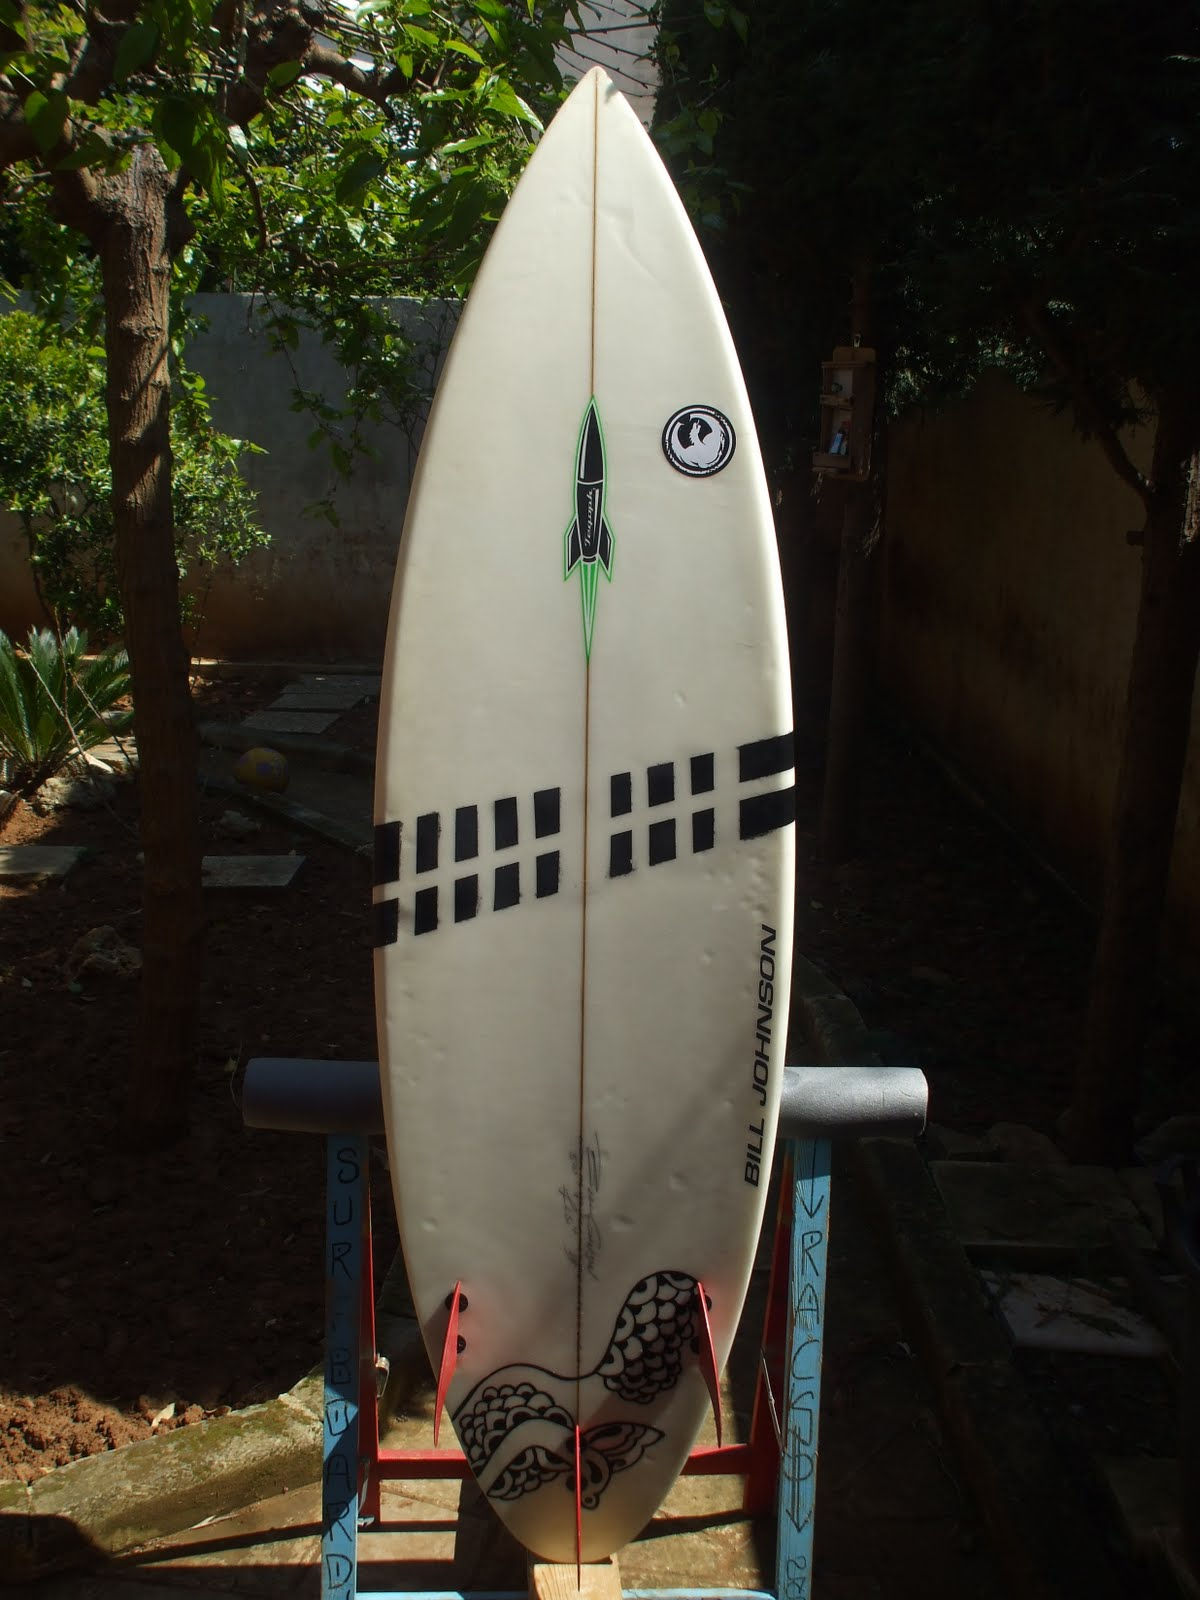 Brindisi surf club tavole usate in vendita ii - Misure tavole da surf ...